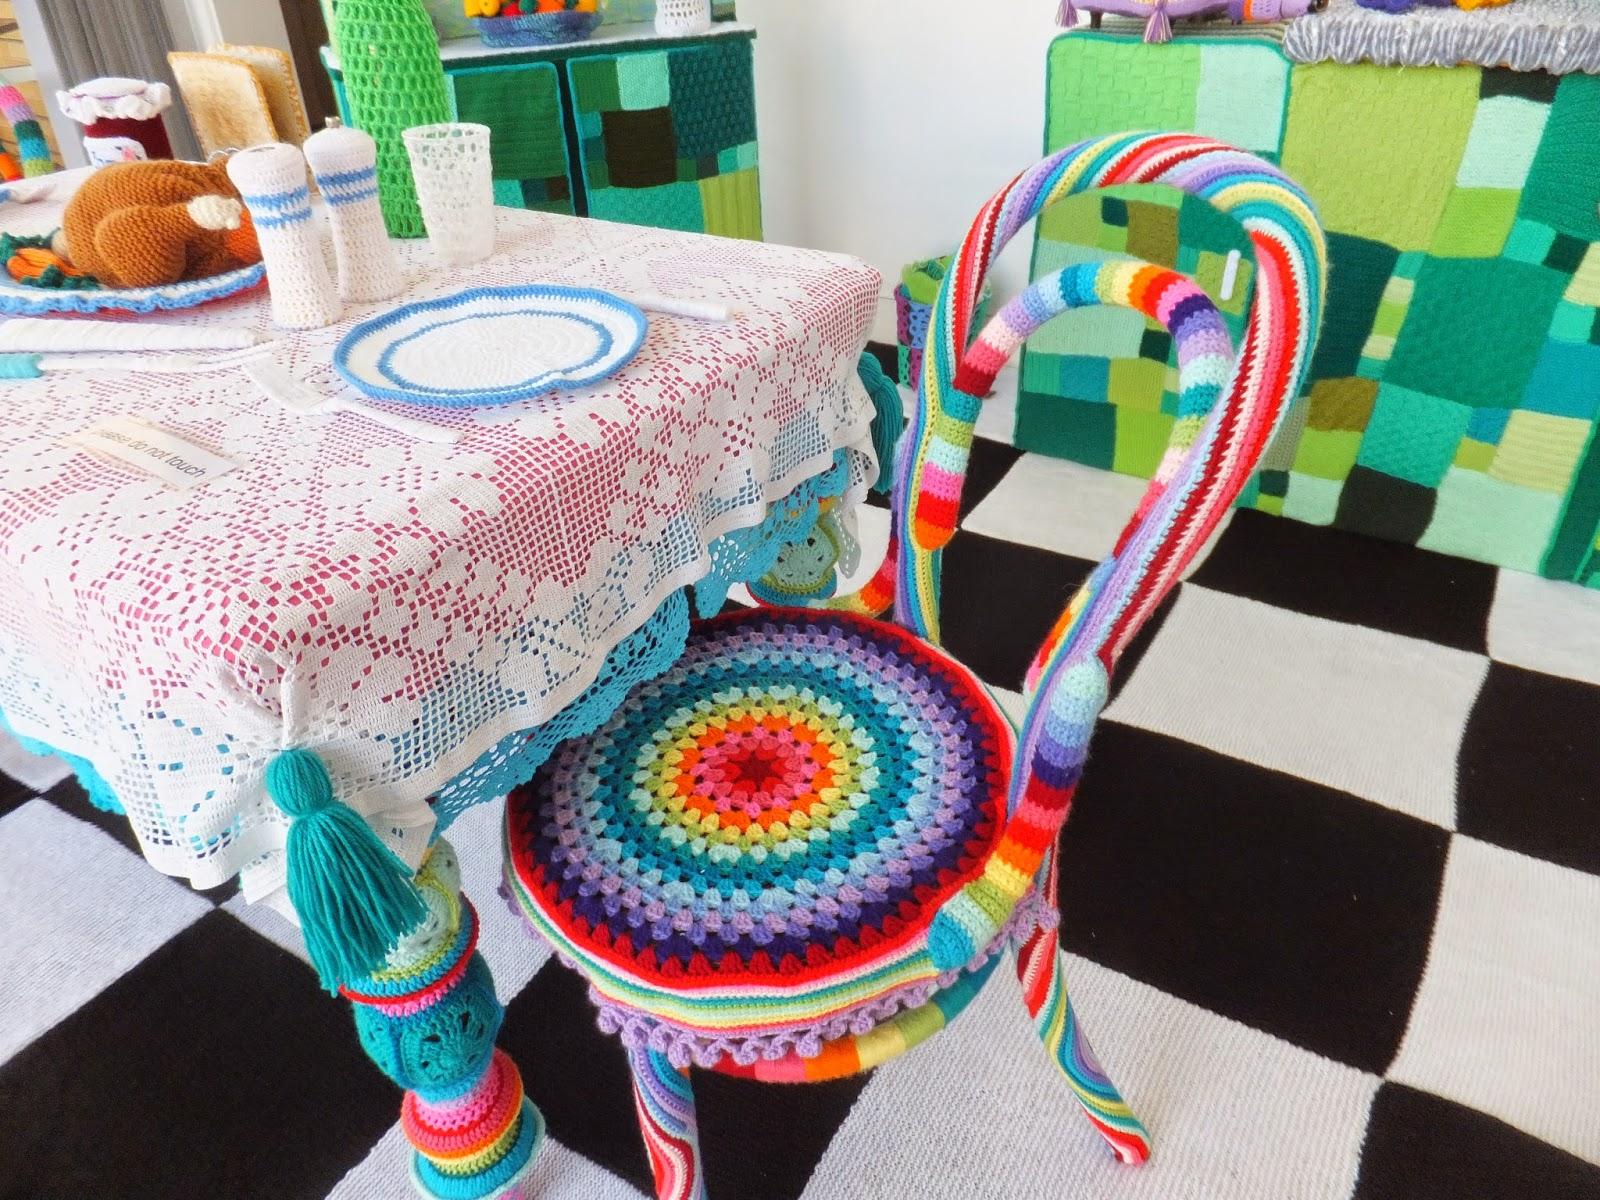 yarn-bombing-warwick-art-gallery-01